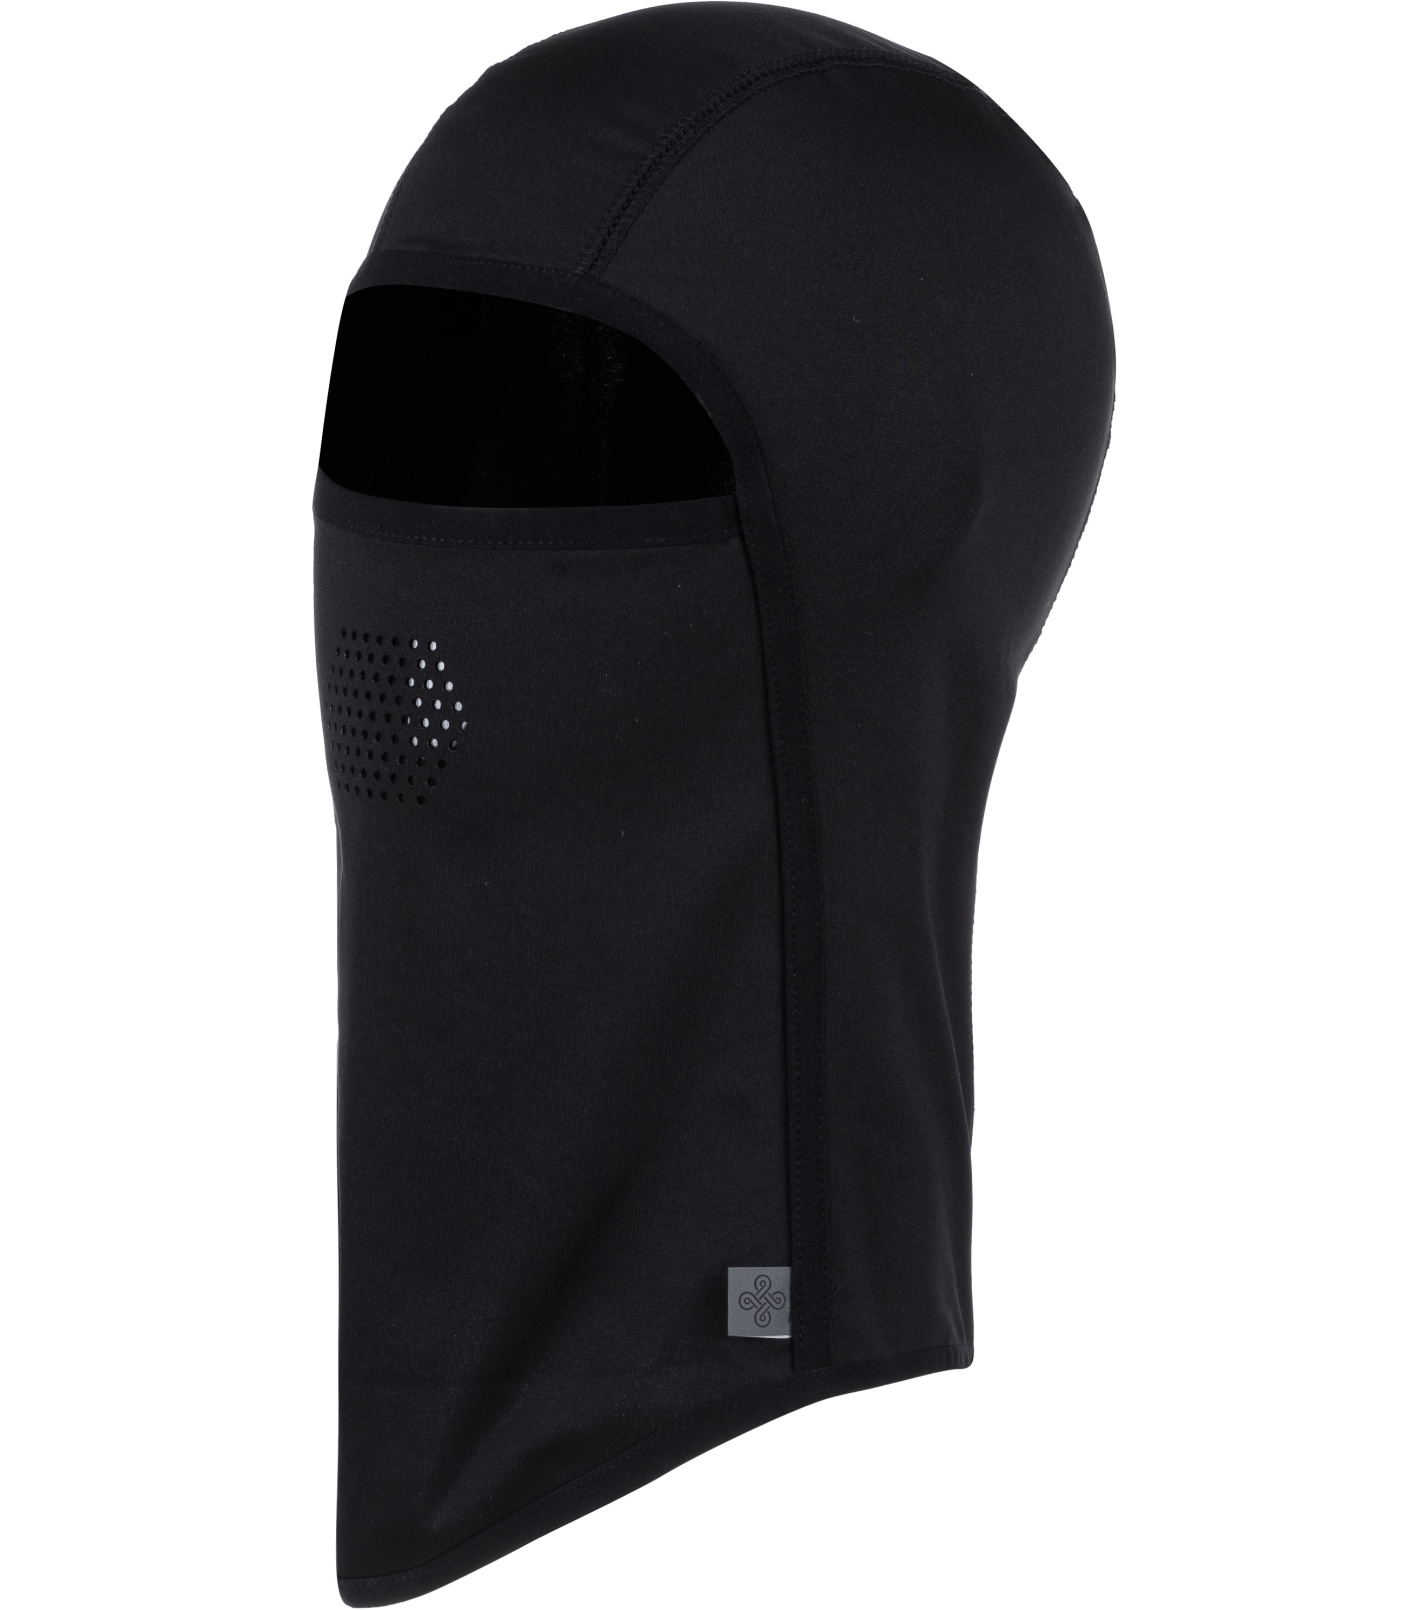 KILPI Celoobličejová maska ROBBER-U LU0005KIBLK Černá S